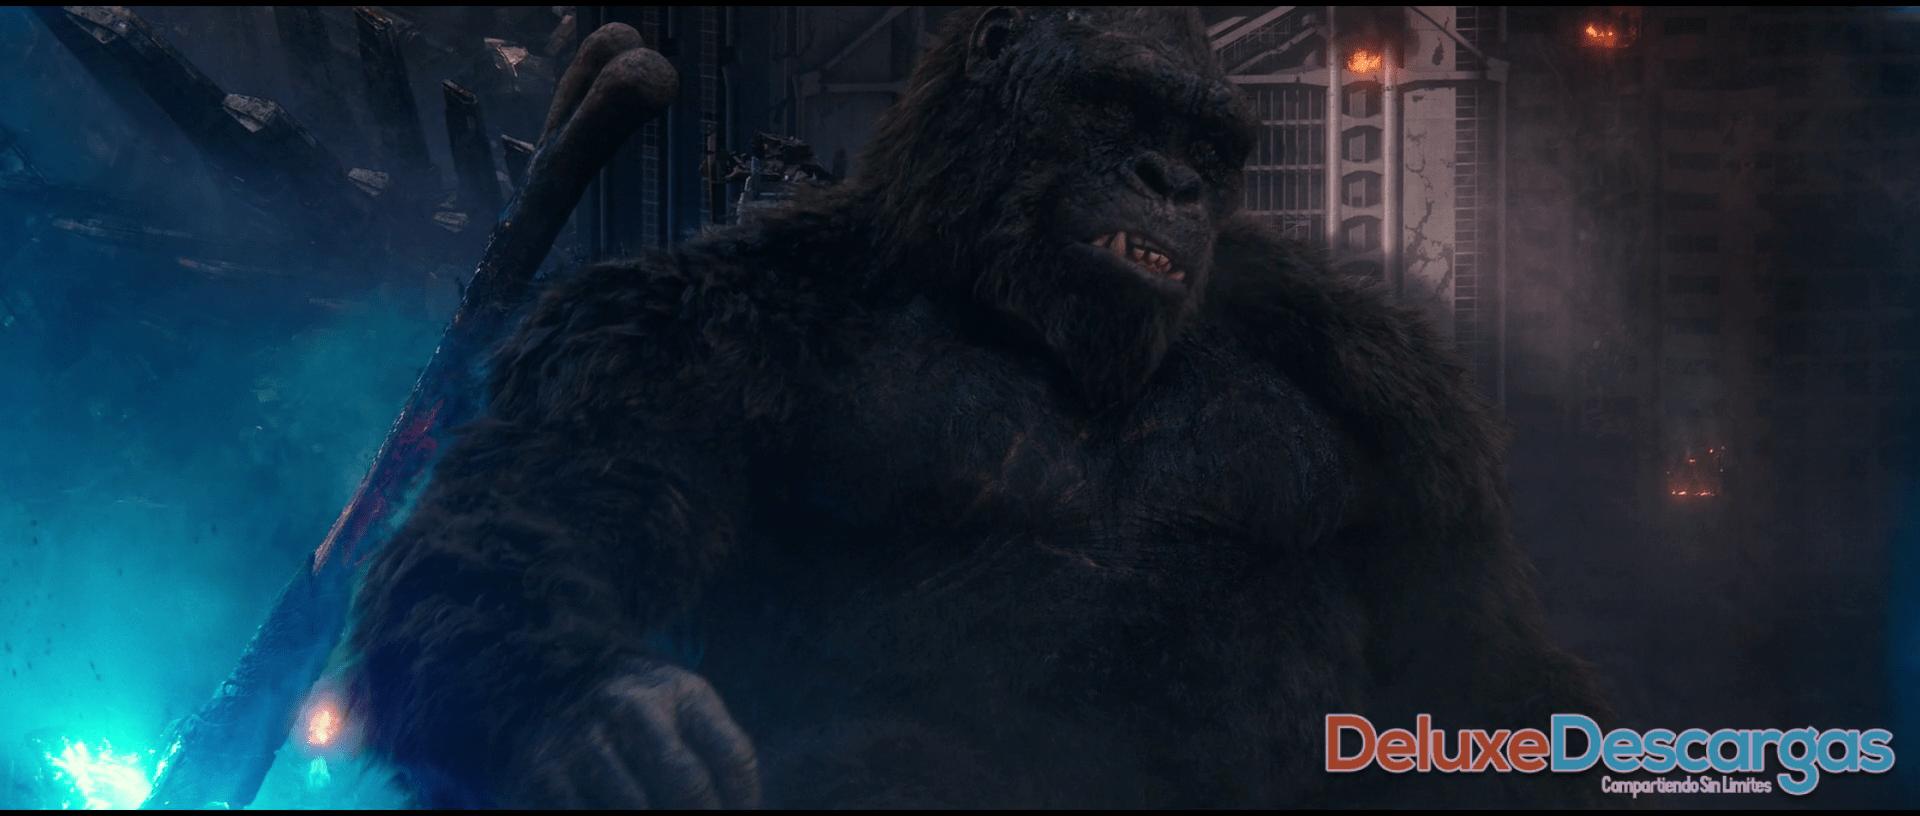 Godzilla vs Kong 1080p (10) min